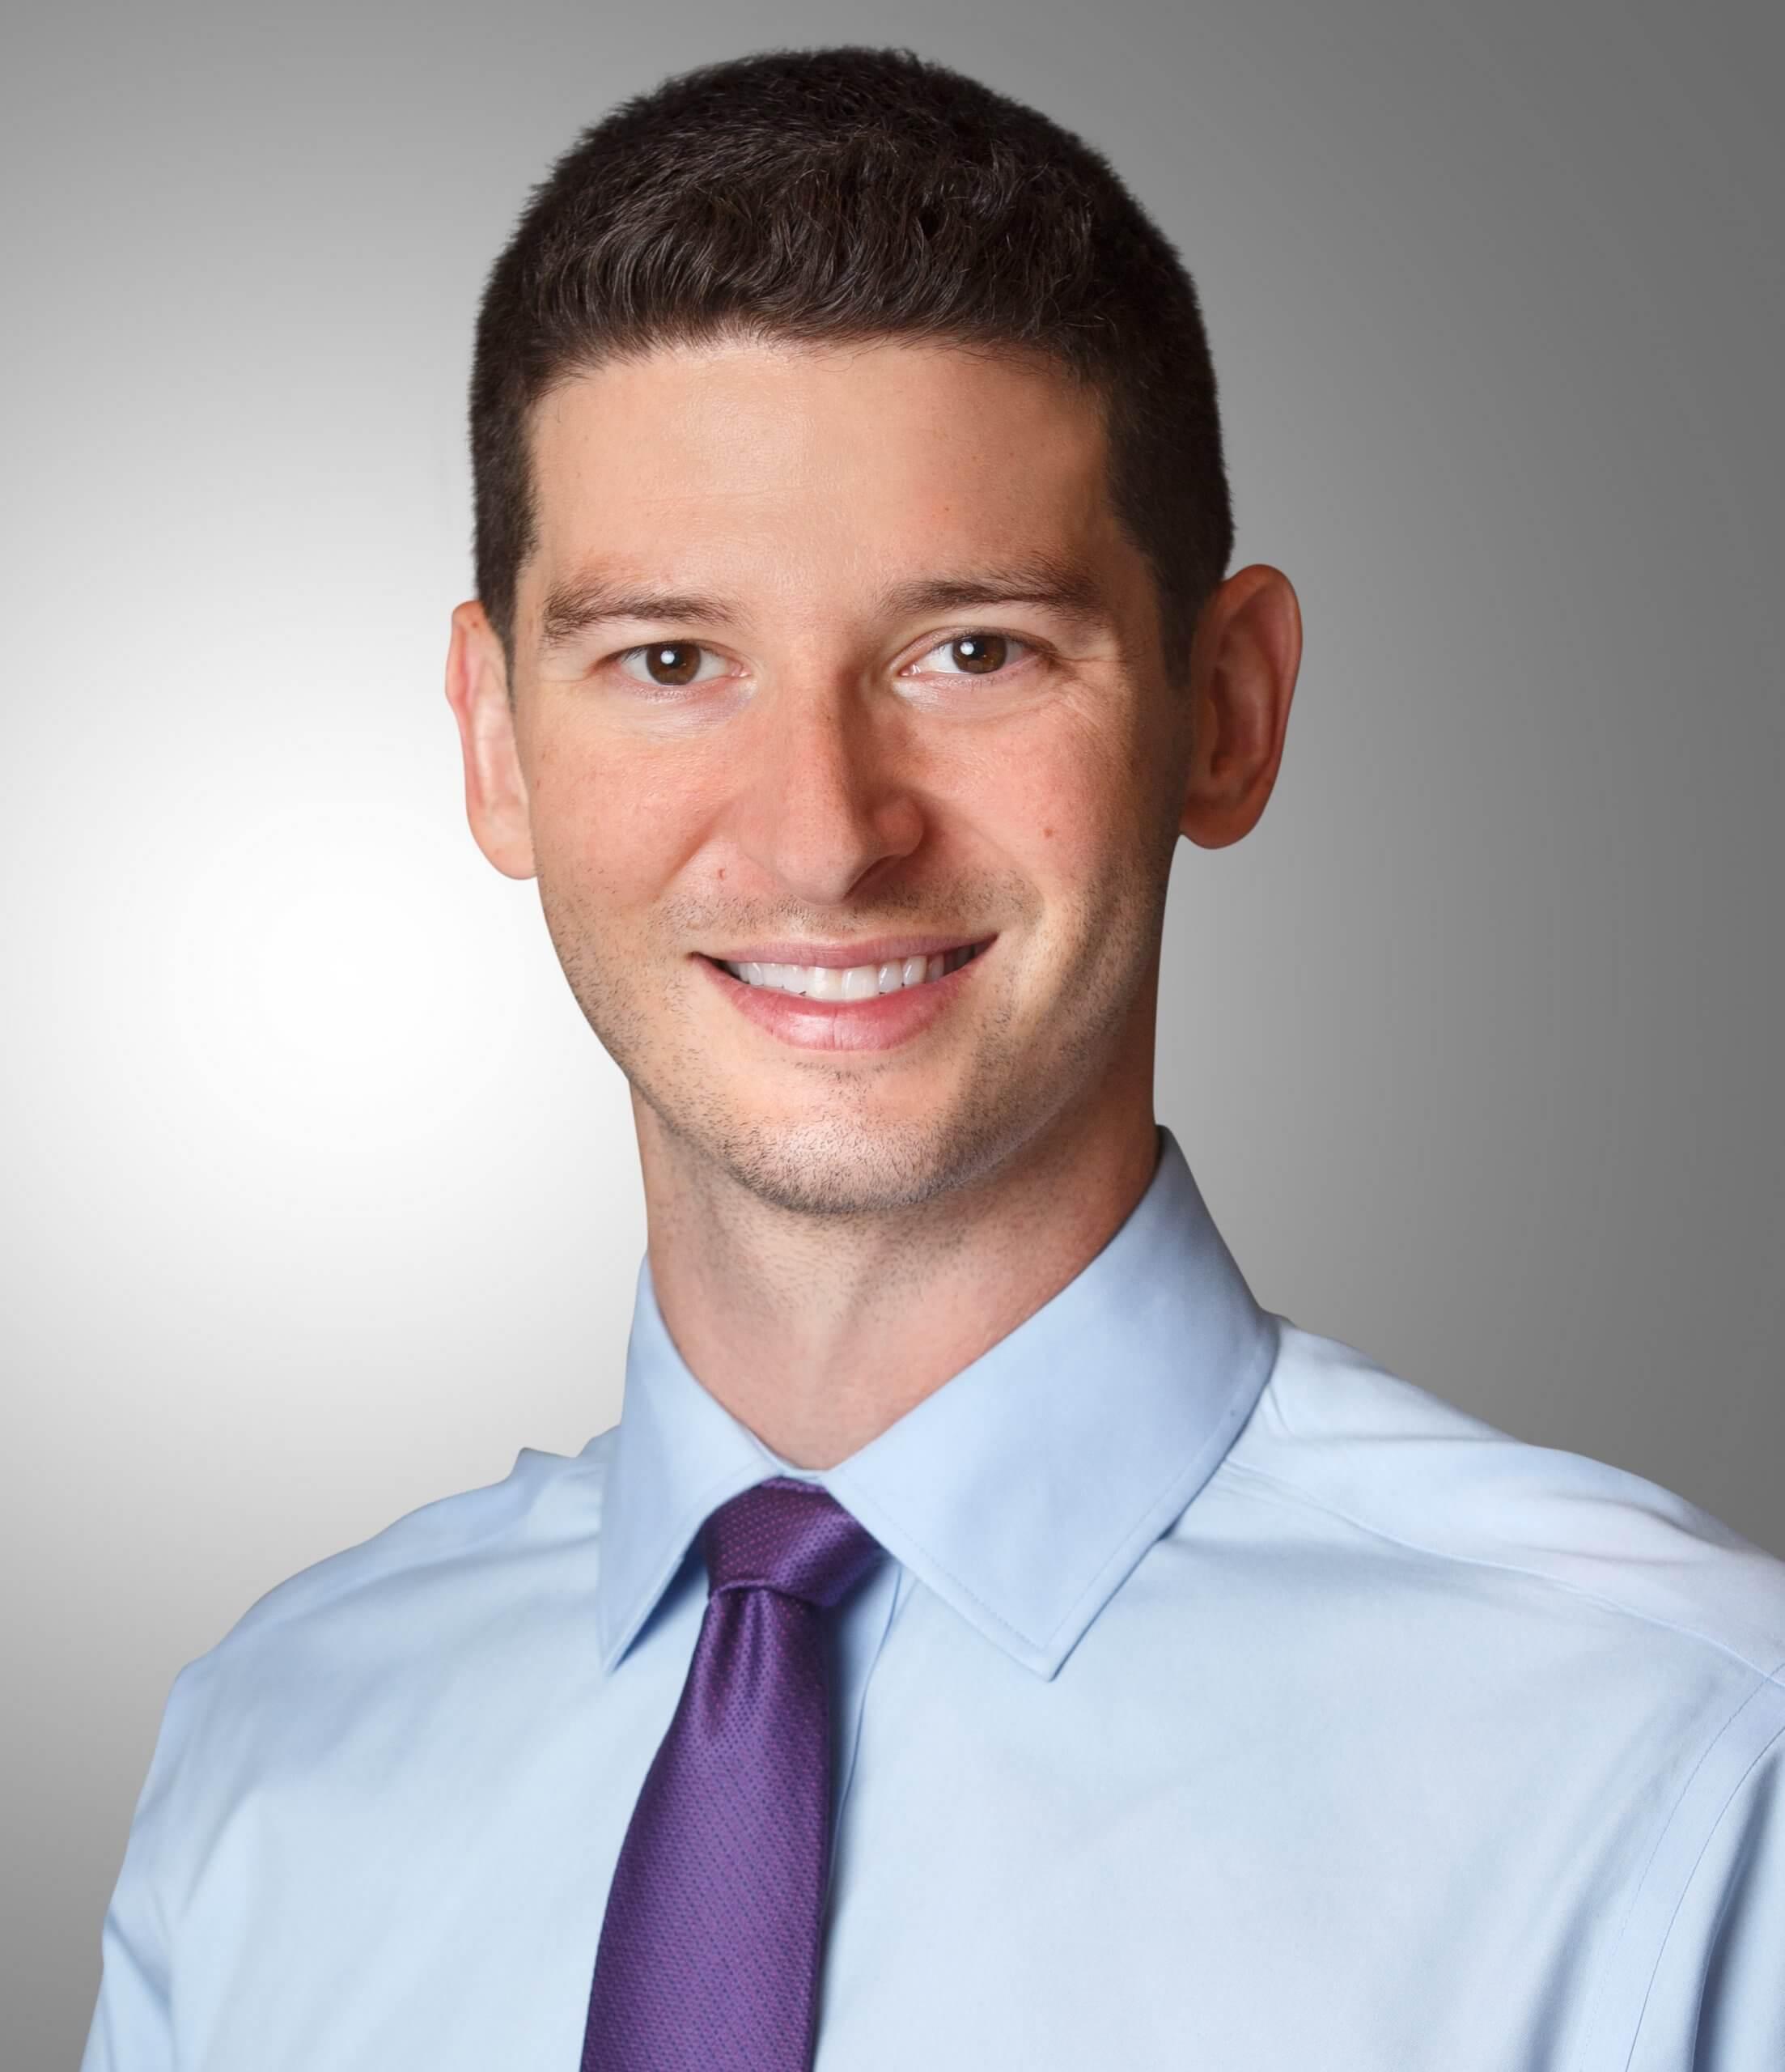 Port Washington Dentist - Dr. Steven F. Kornhaber